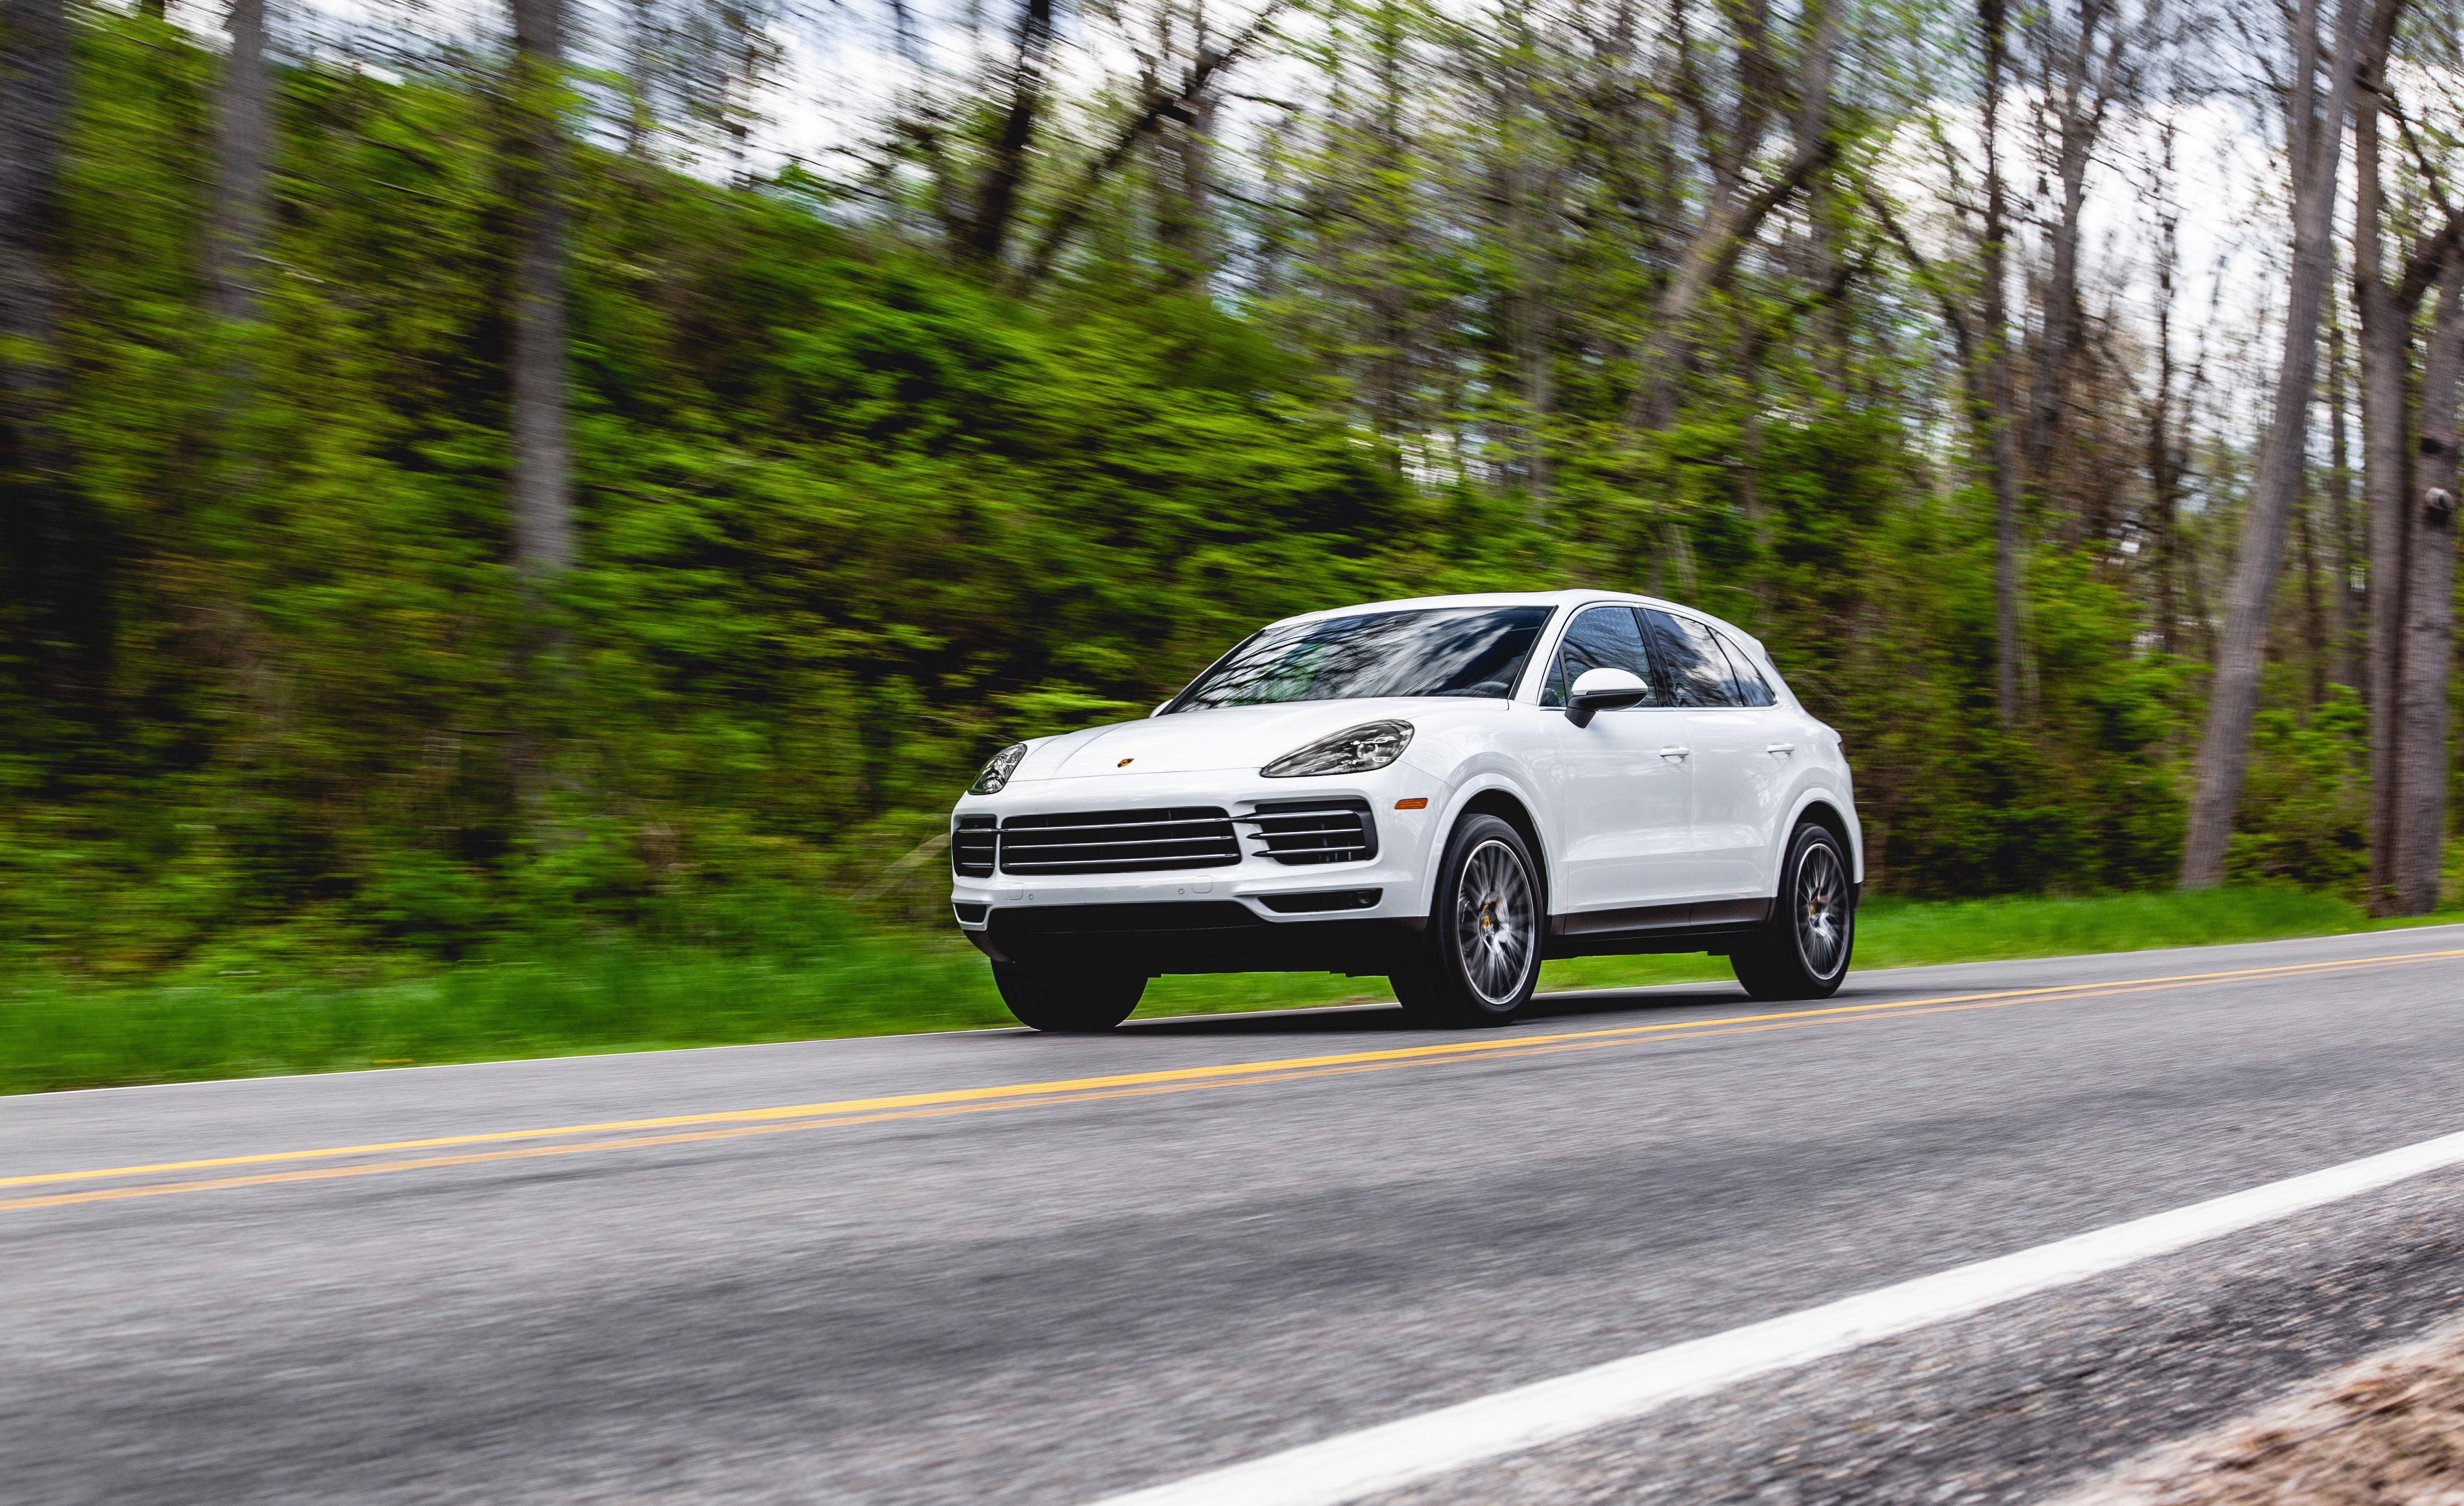 2019 Porsche Cayenne S \u2013 High,Performance AWD SUV